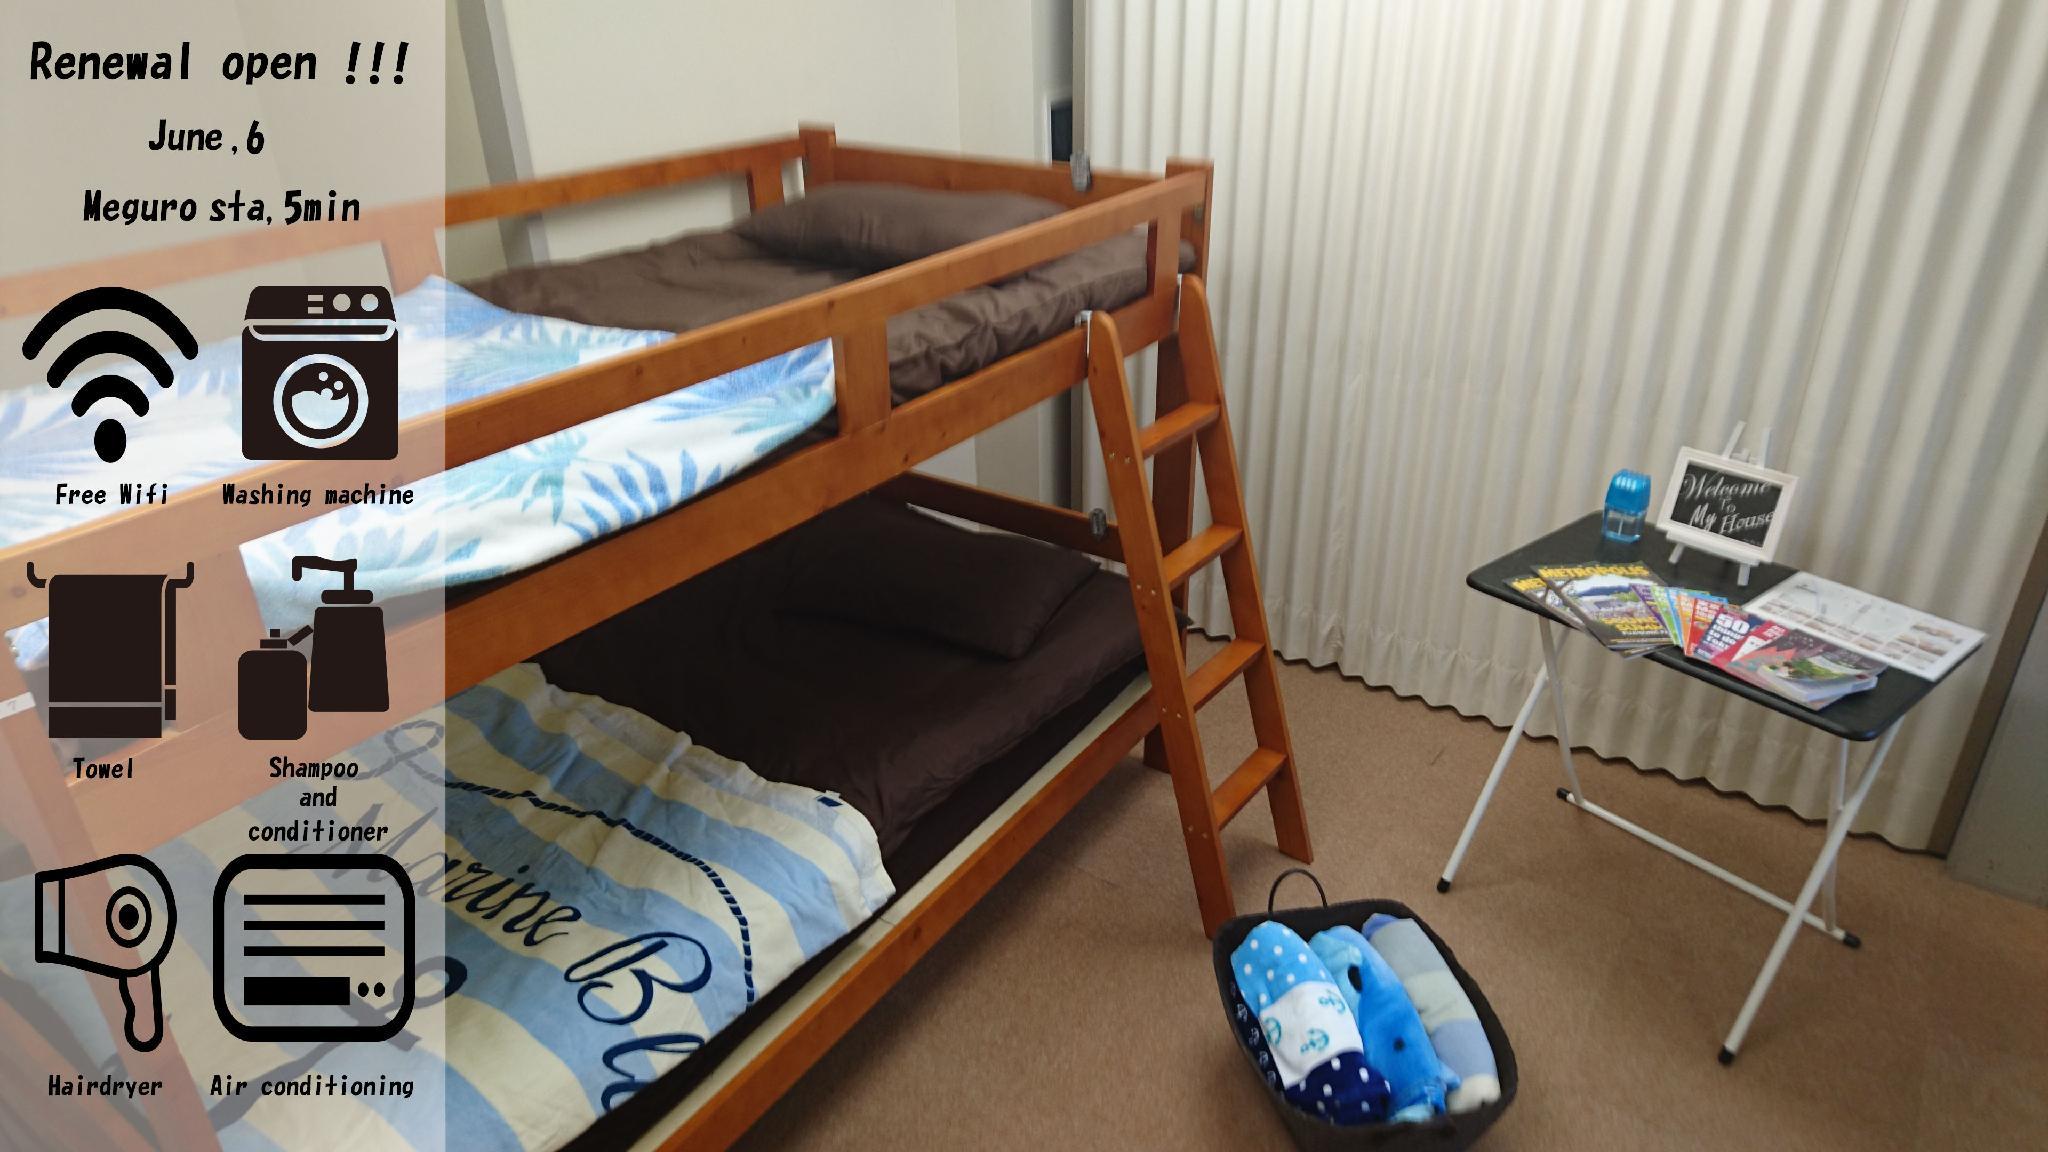 MC Dormitory in Meguro, Meguro